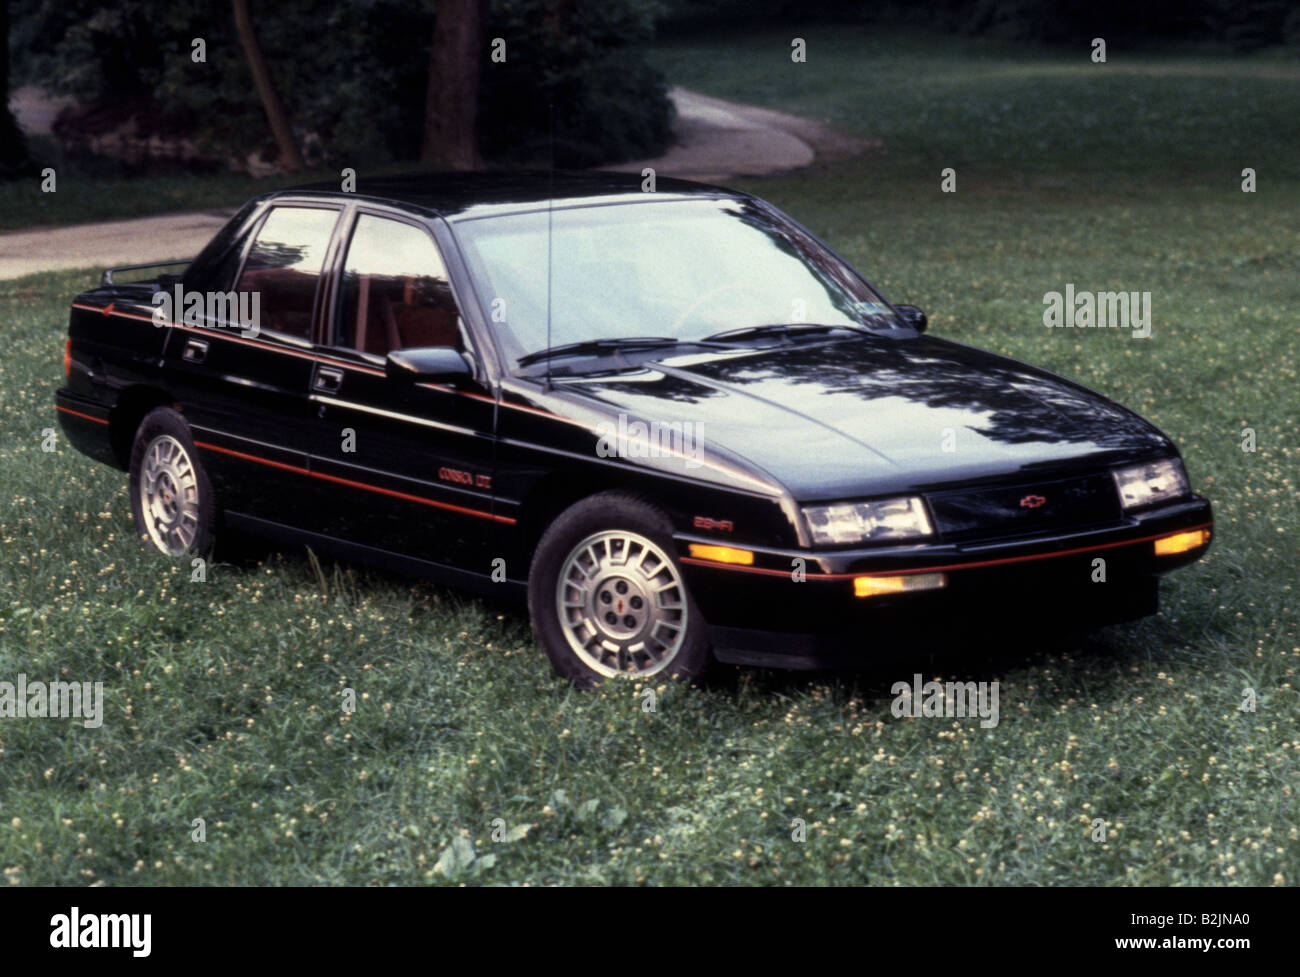 Chevrolet Corsica Ltz Chevy Automobile Auto General Motors Gm Motoren Stockfotografie Alamy